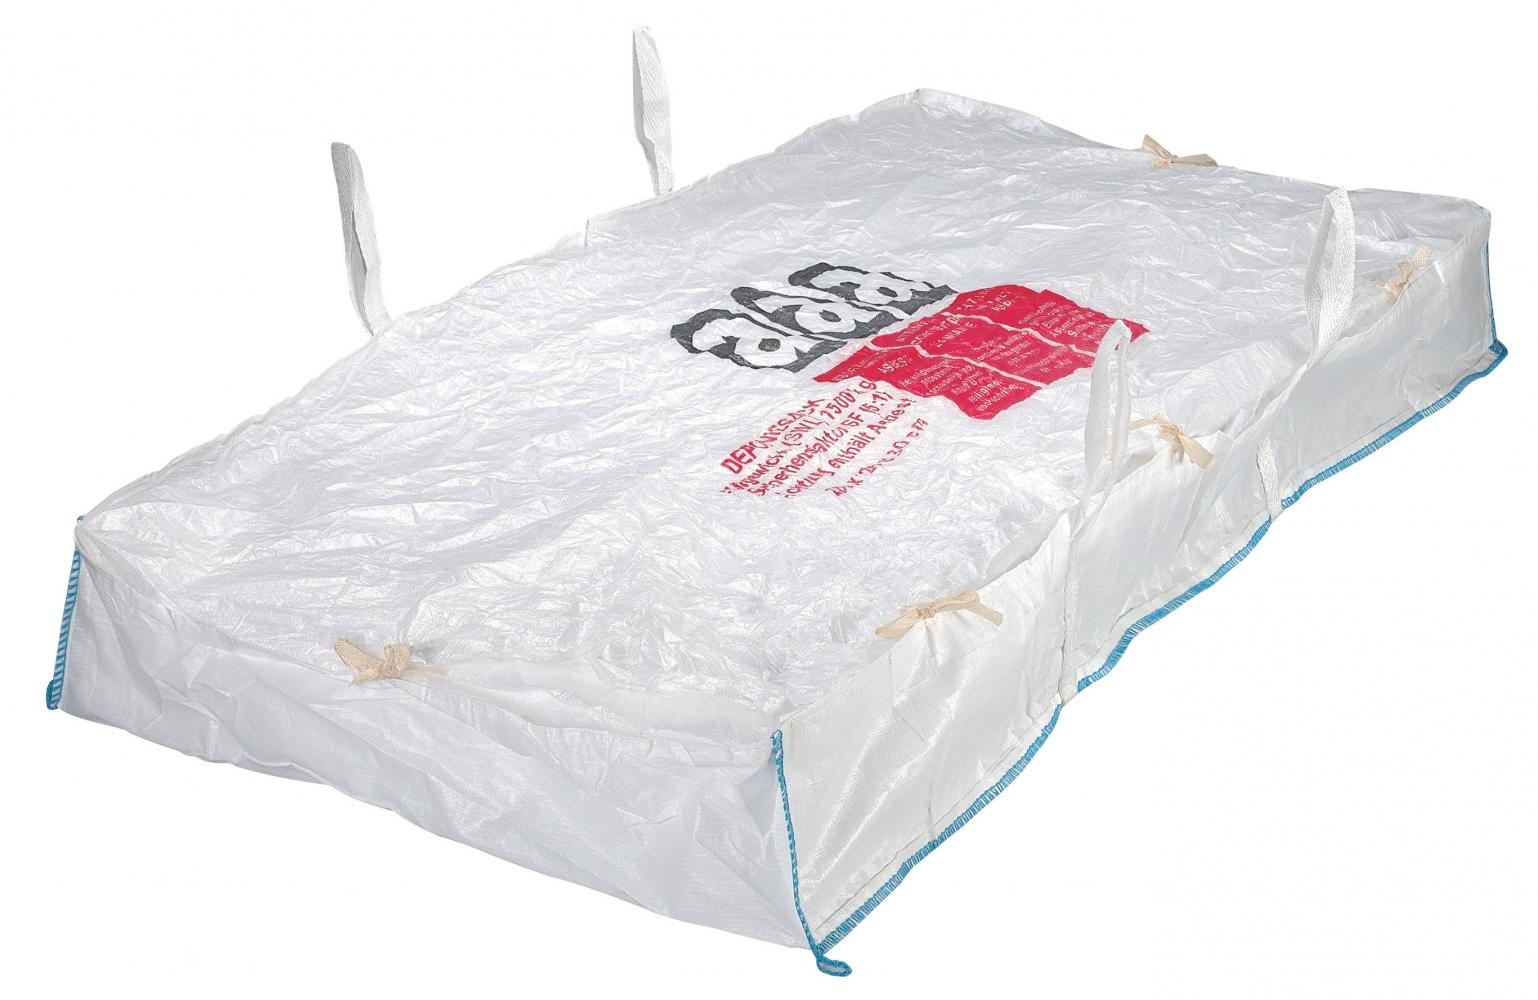 big bags 8478 slab bag asbestos 260 x 125 x 30cm. Black Bedroom Furniture Sets. Home Design Ideas